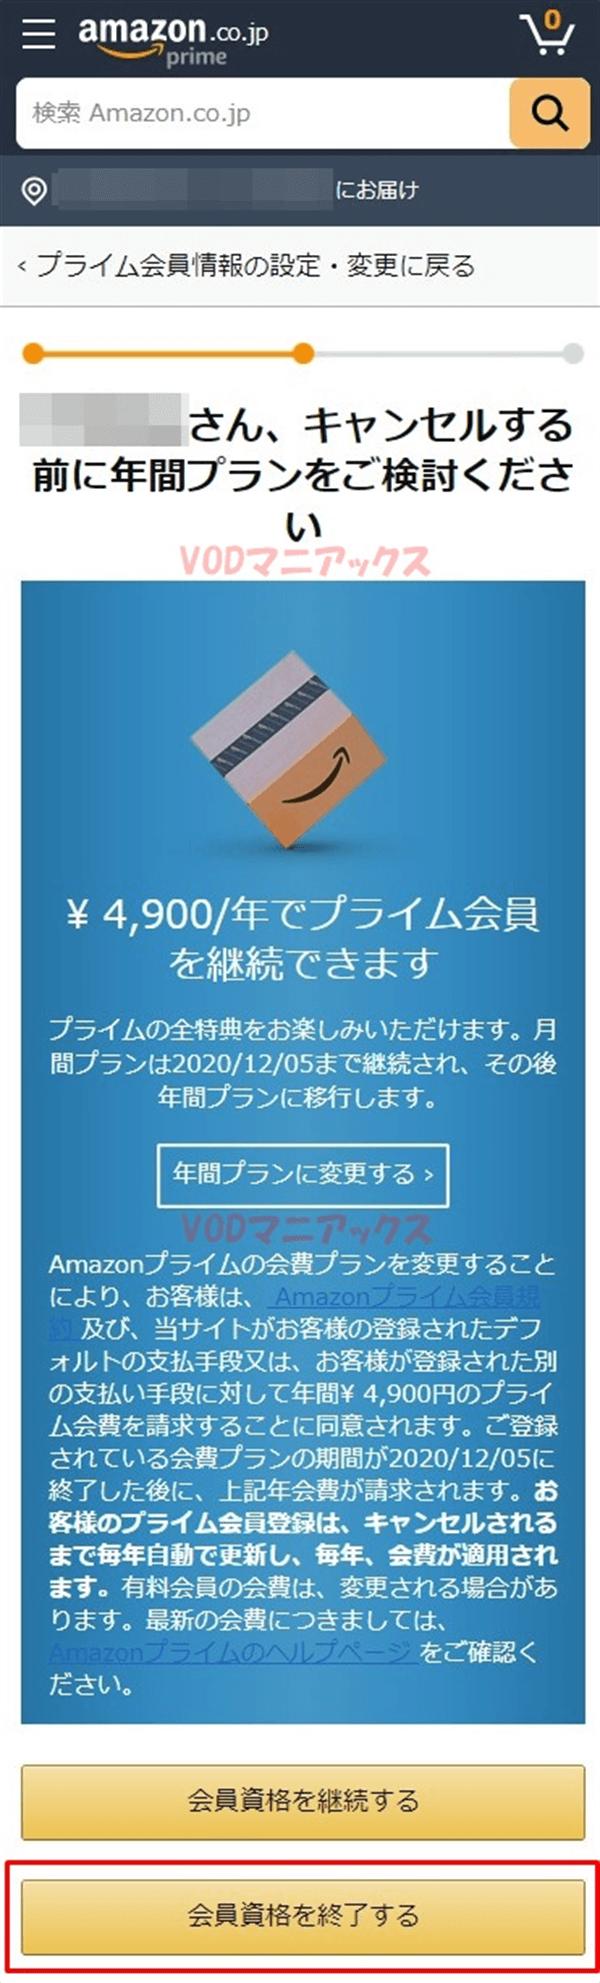 Amazonプライムビデオ解約年間プラン